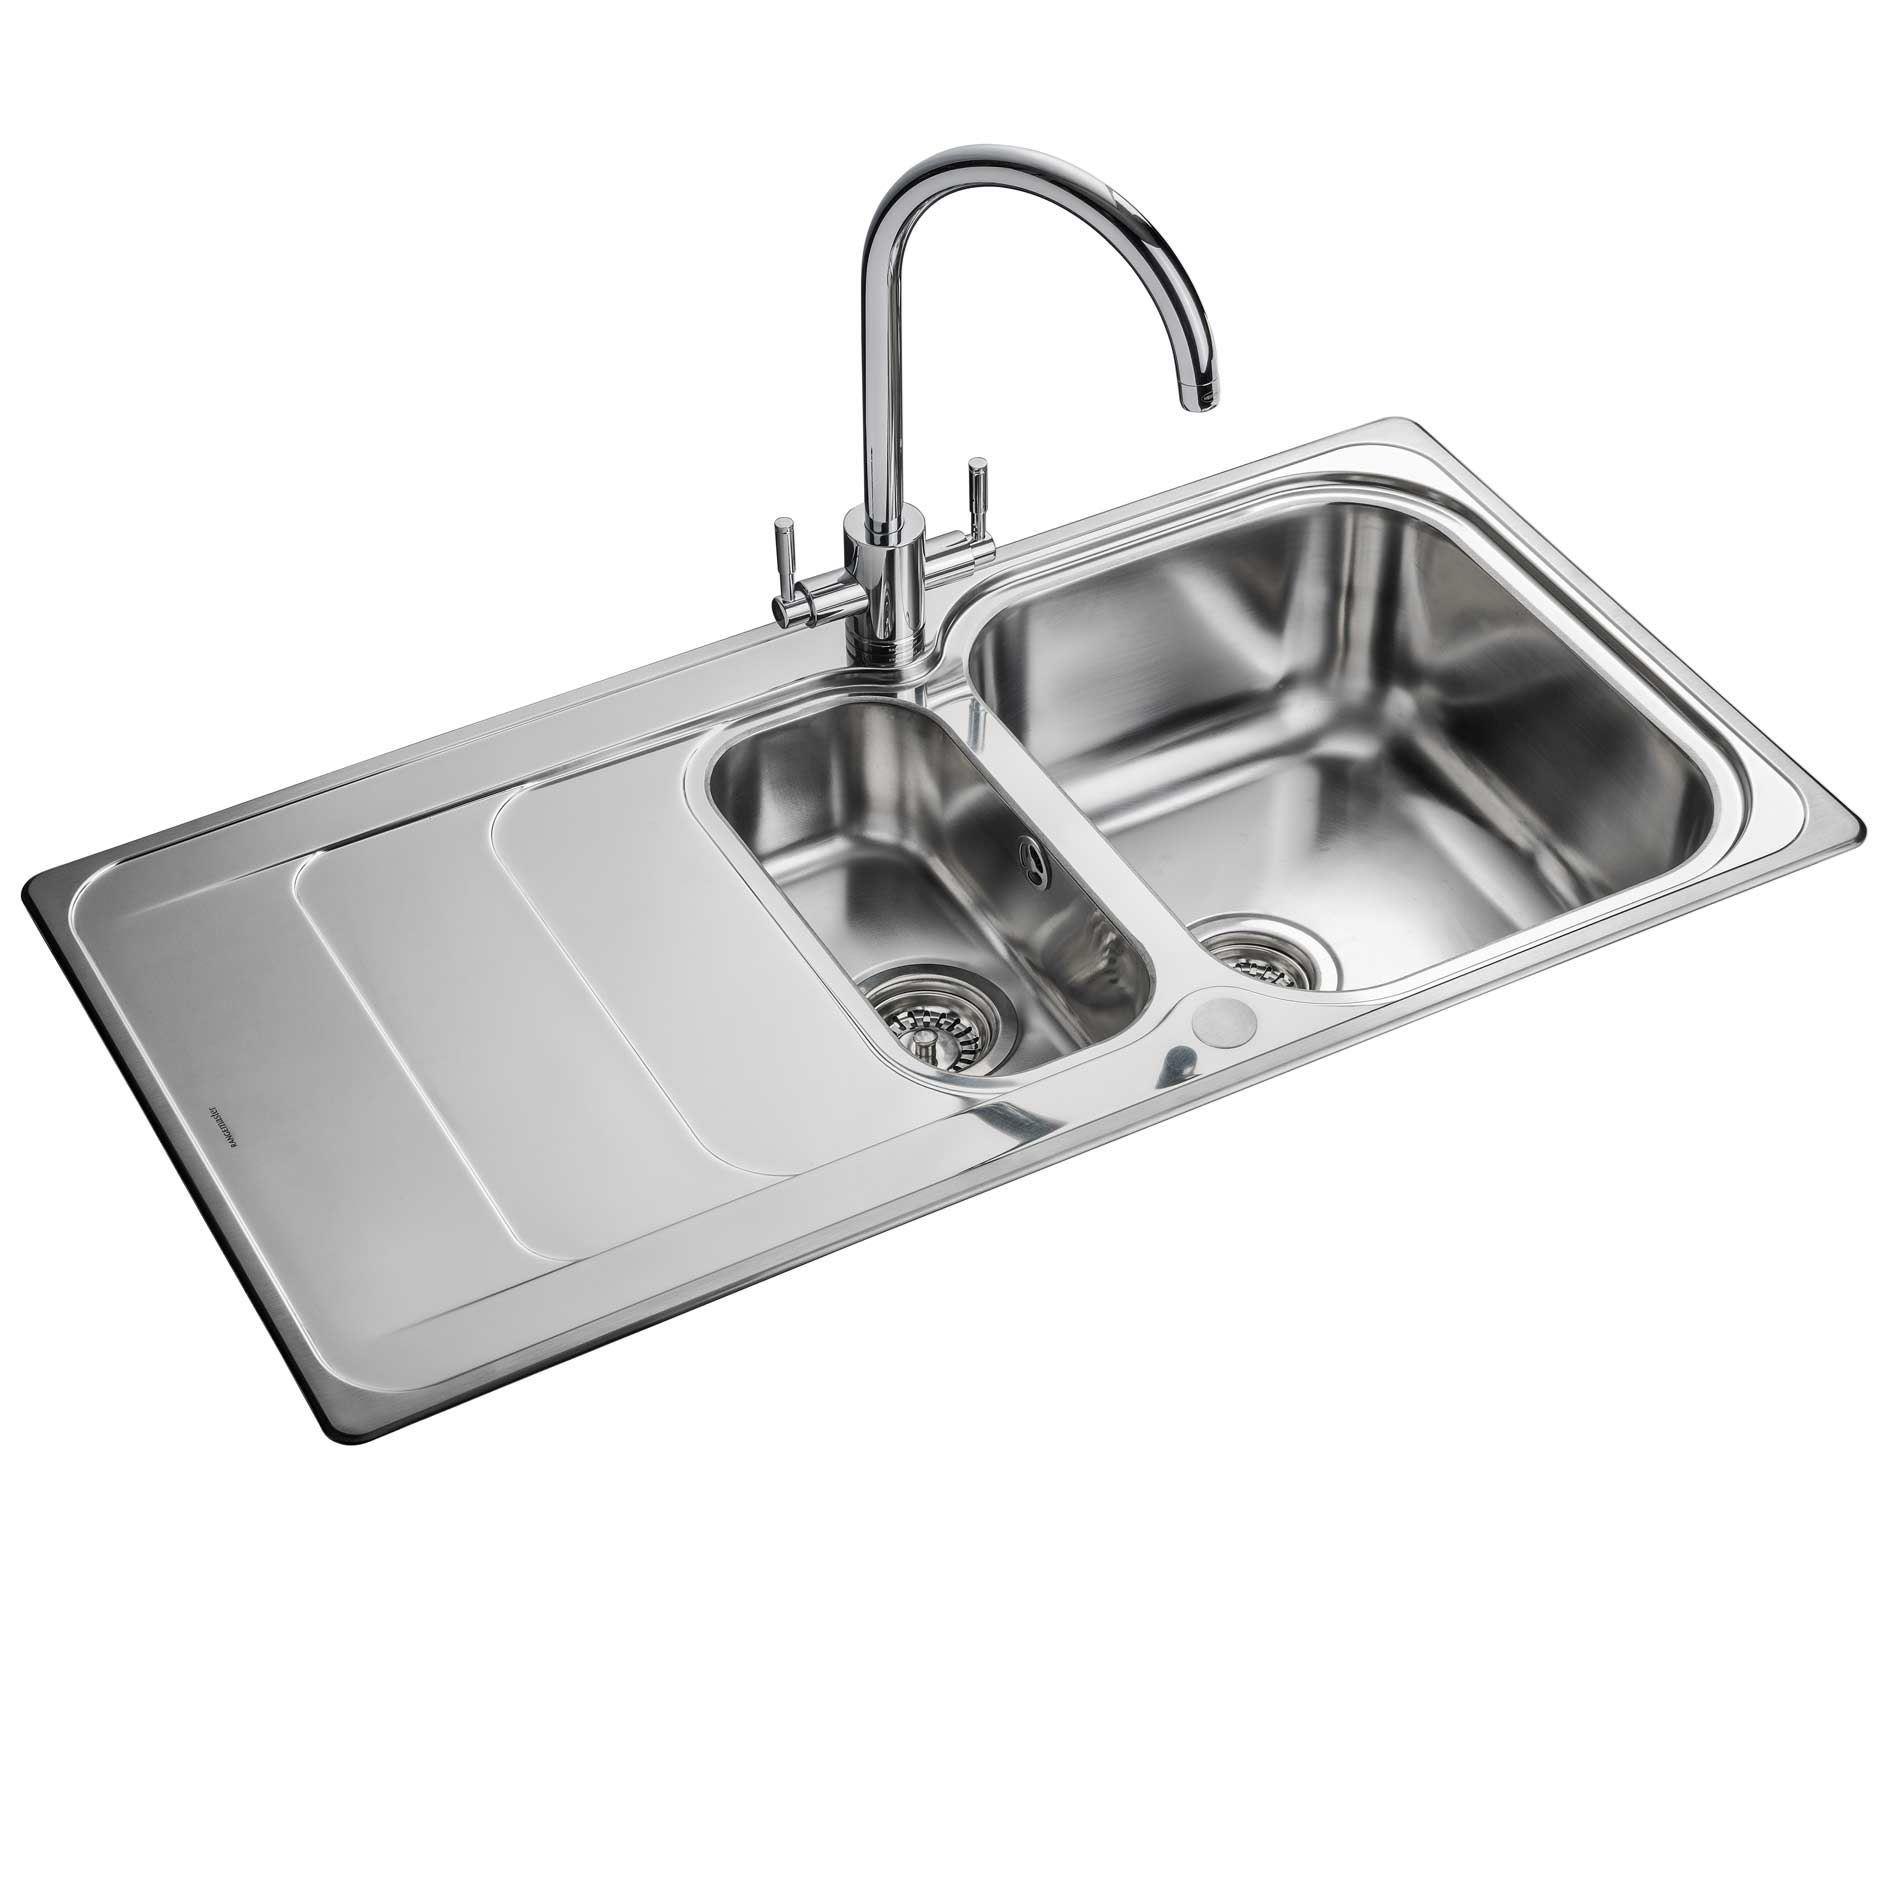 ... : Houston 1-5 HS9852 Stainless Steel Sink - Kitchen Sinks & Taps